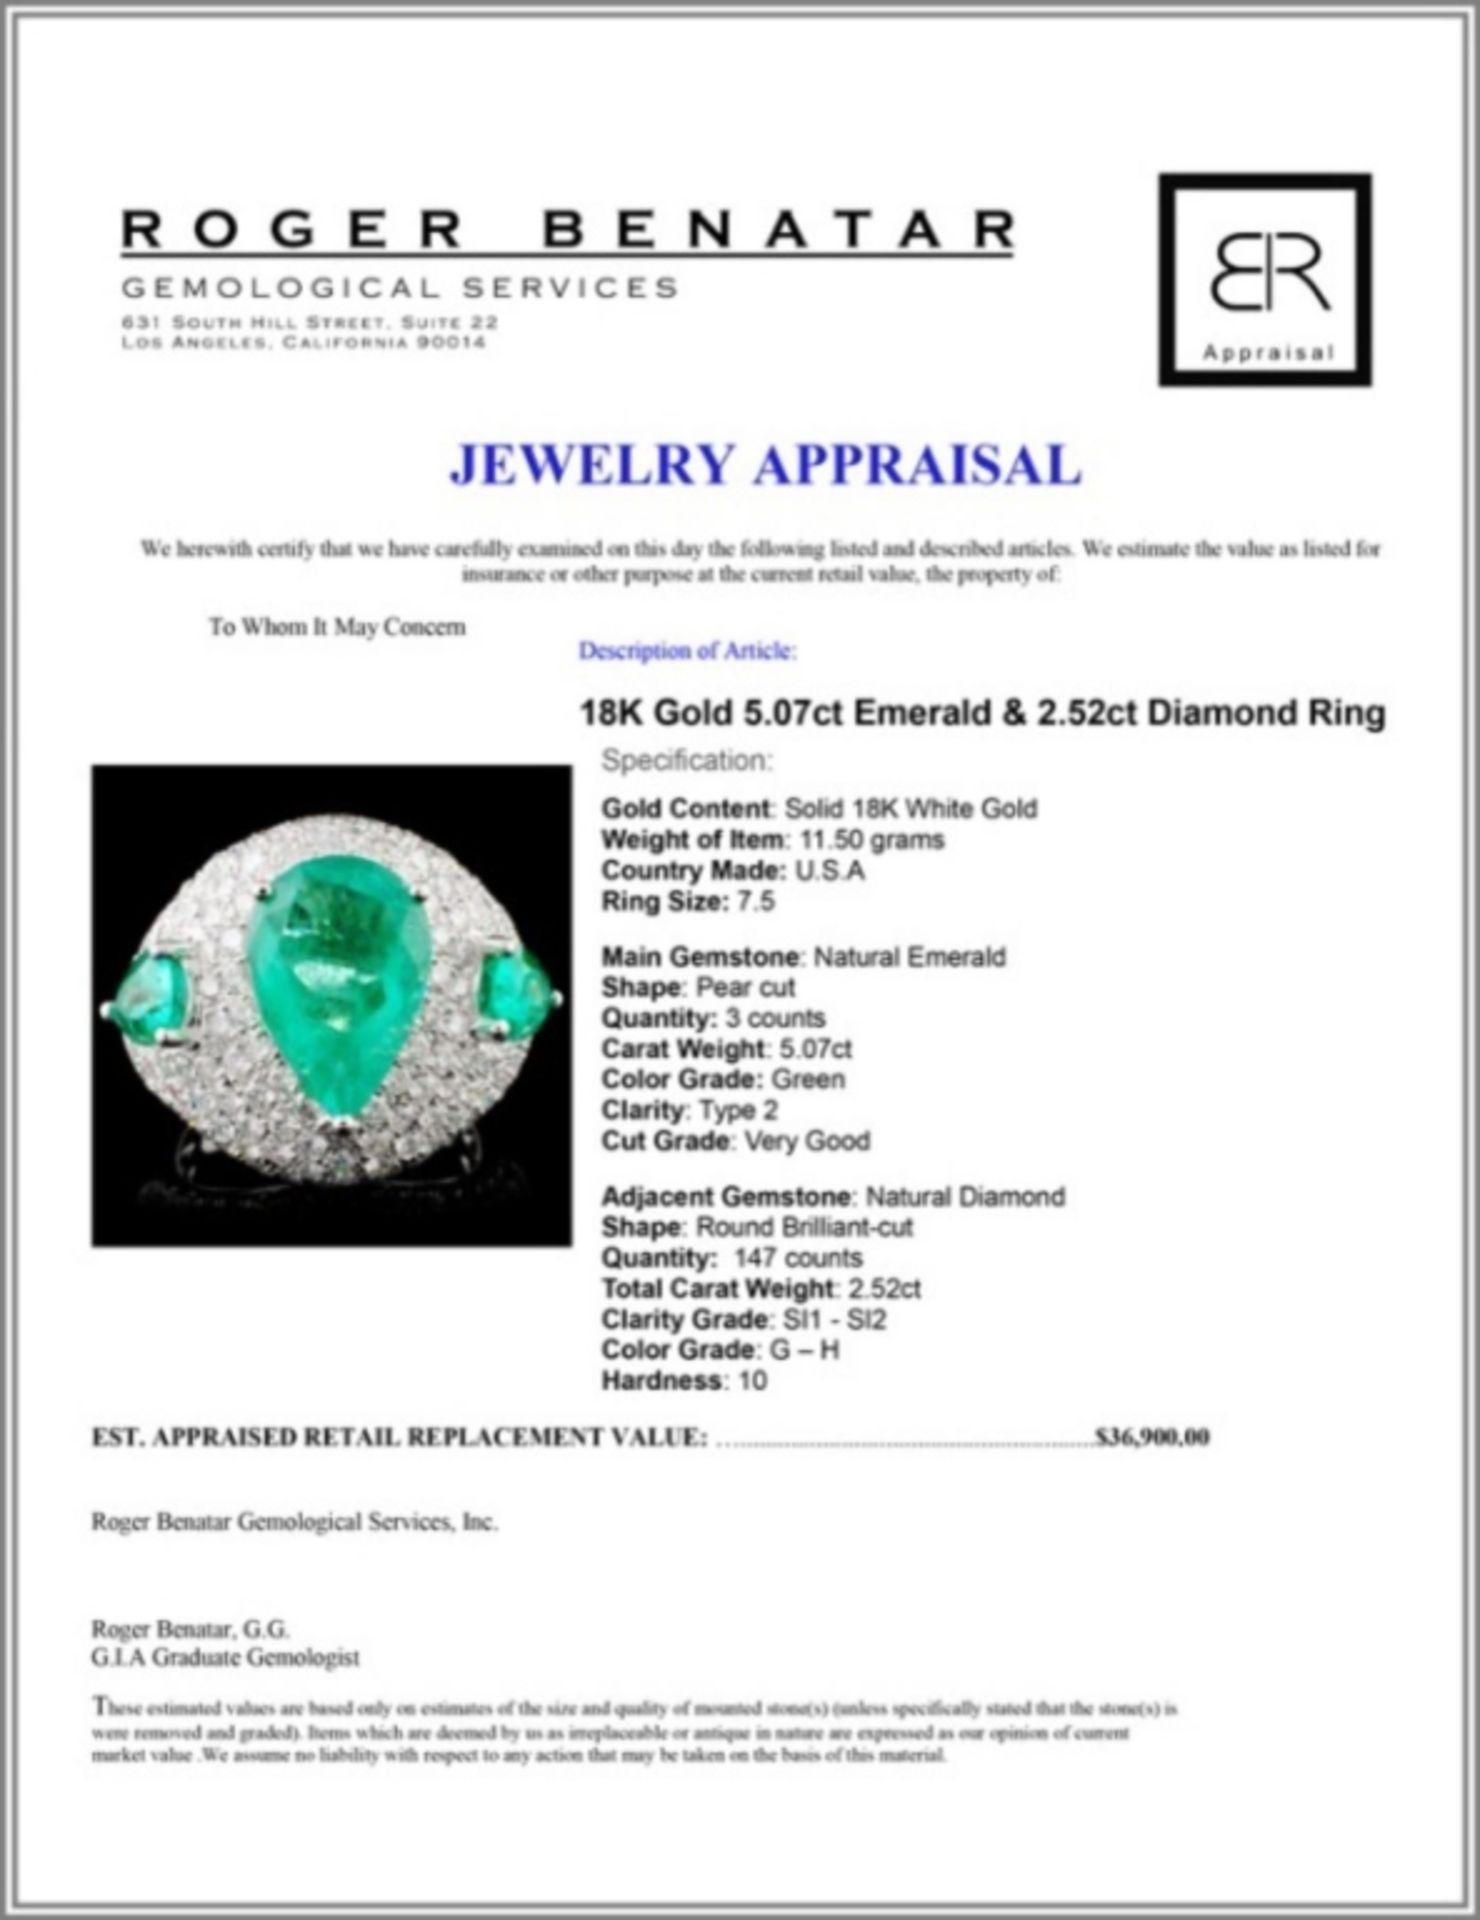 18K Gold 5.07ct Emerald & 2.52ct Diamond Ring - Image 4 of 4